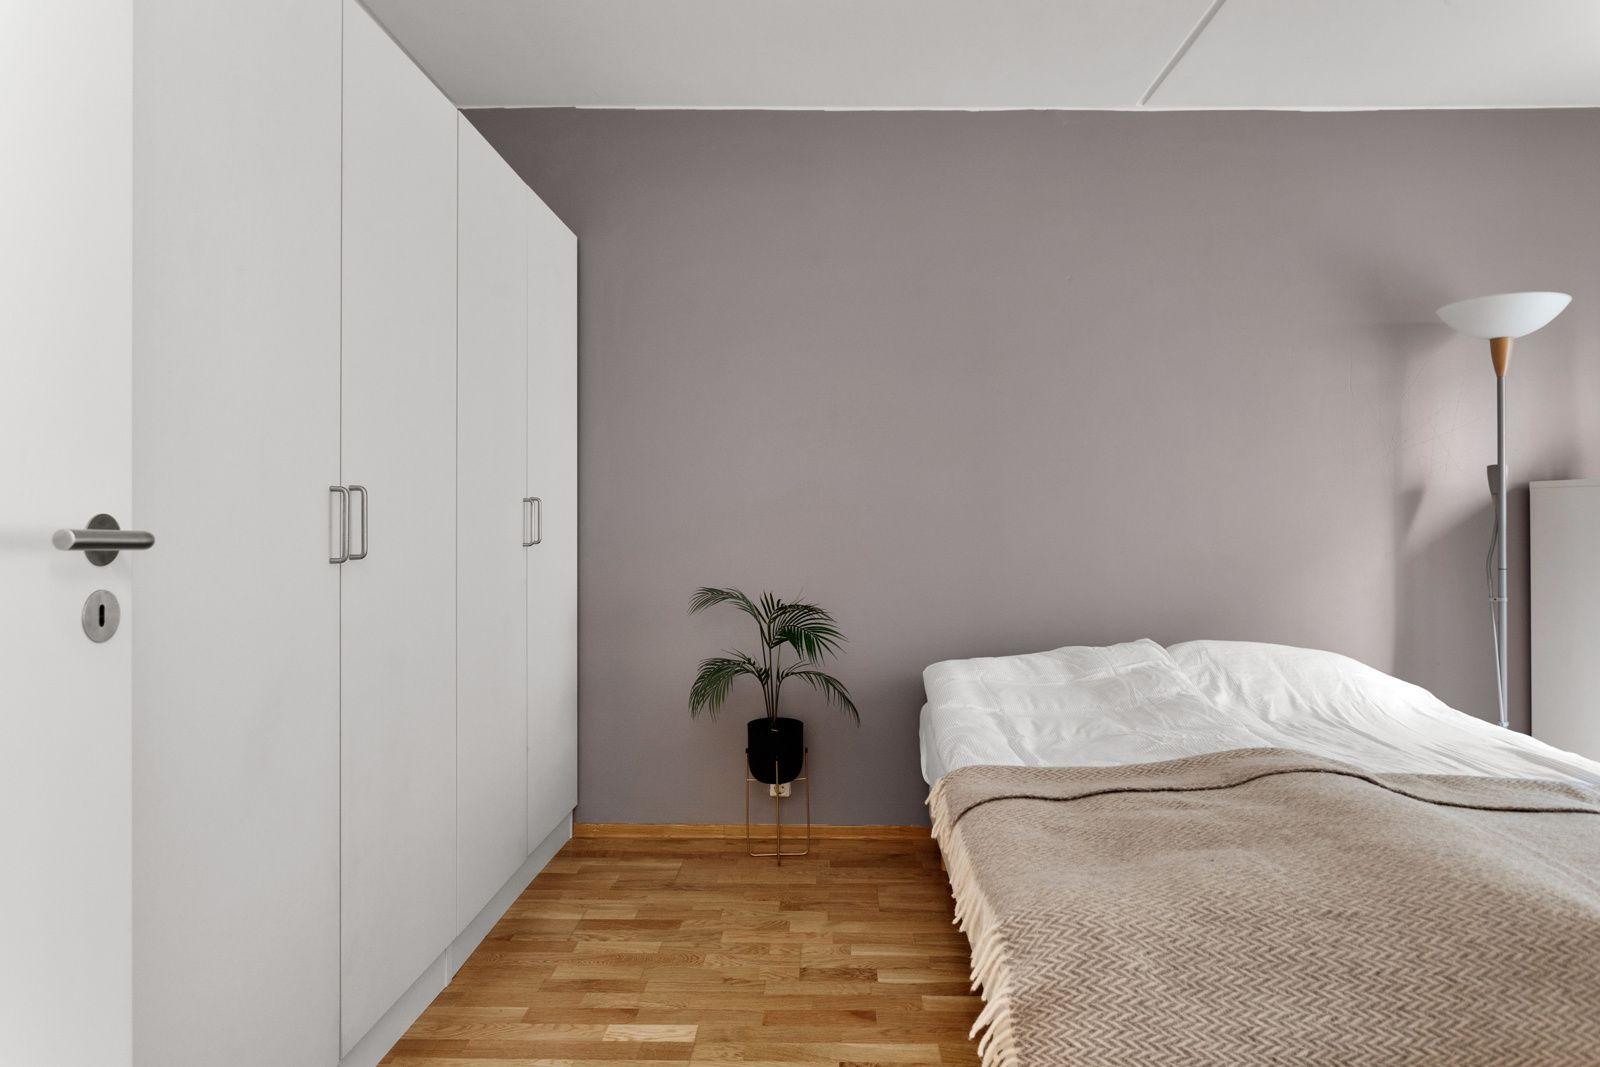 Nydalen allé 23 Stort soverom med garderobeplass for 2 personer.